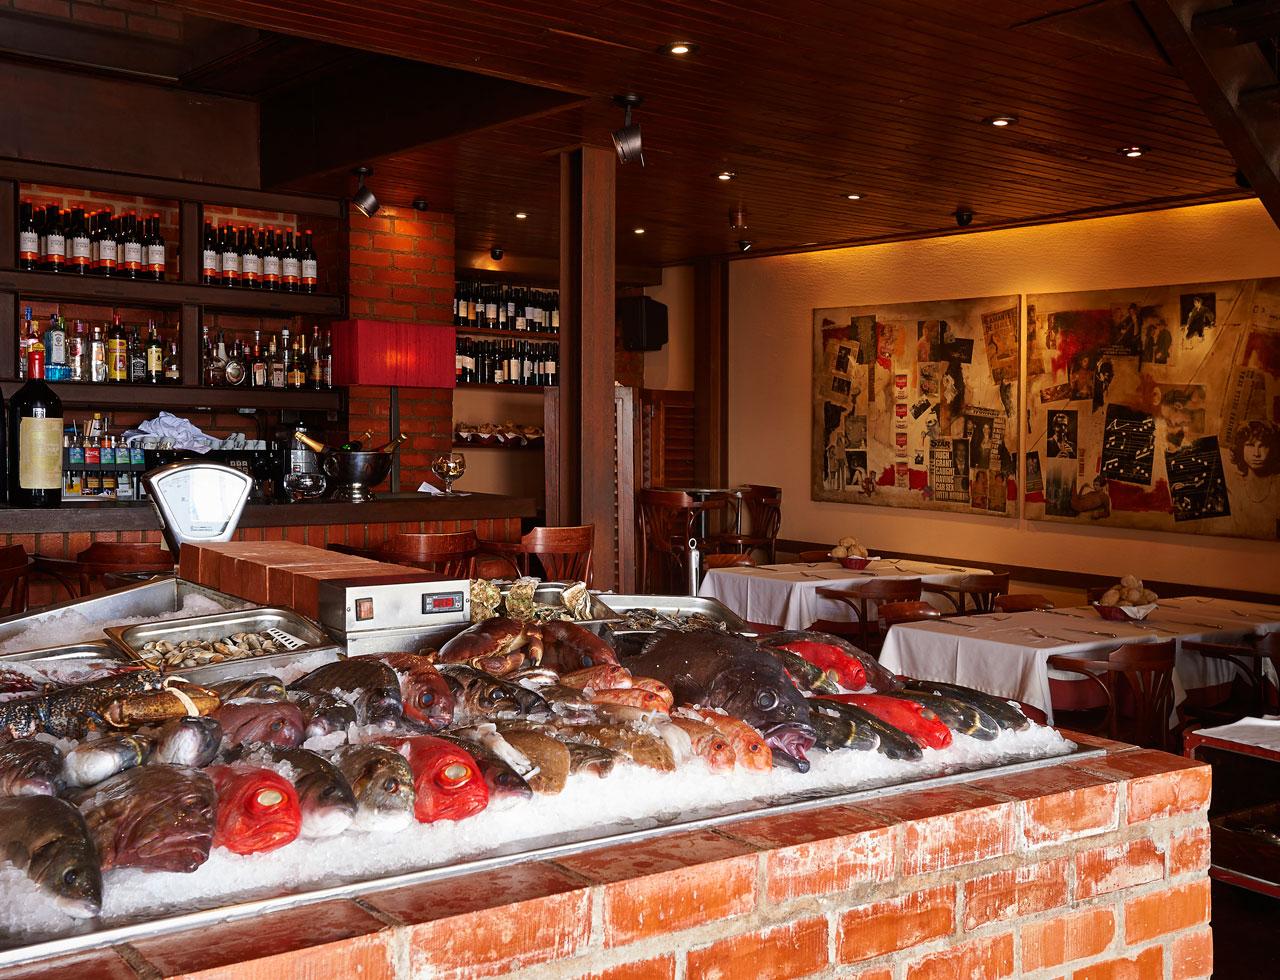 Doca do Peixe - Restaurant Poissons et Crustaces - Lisbonne - Alcantara